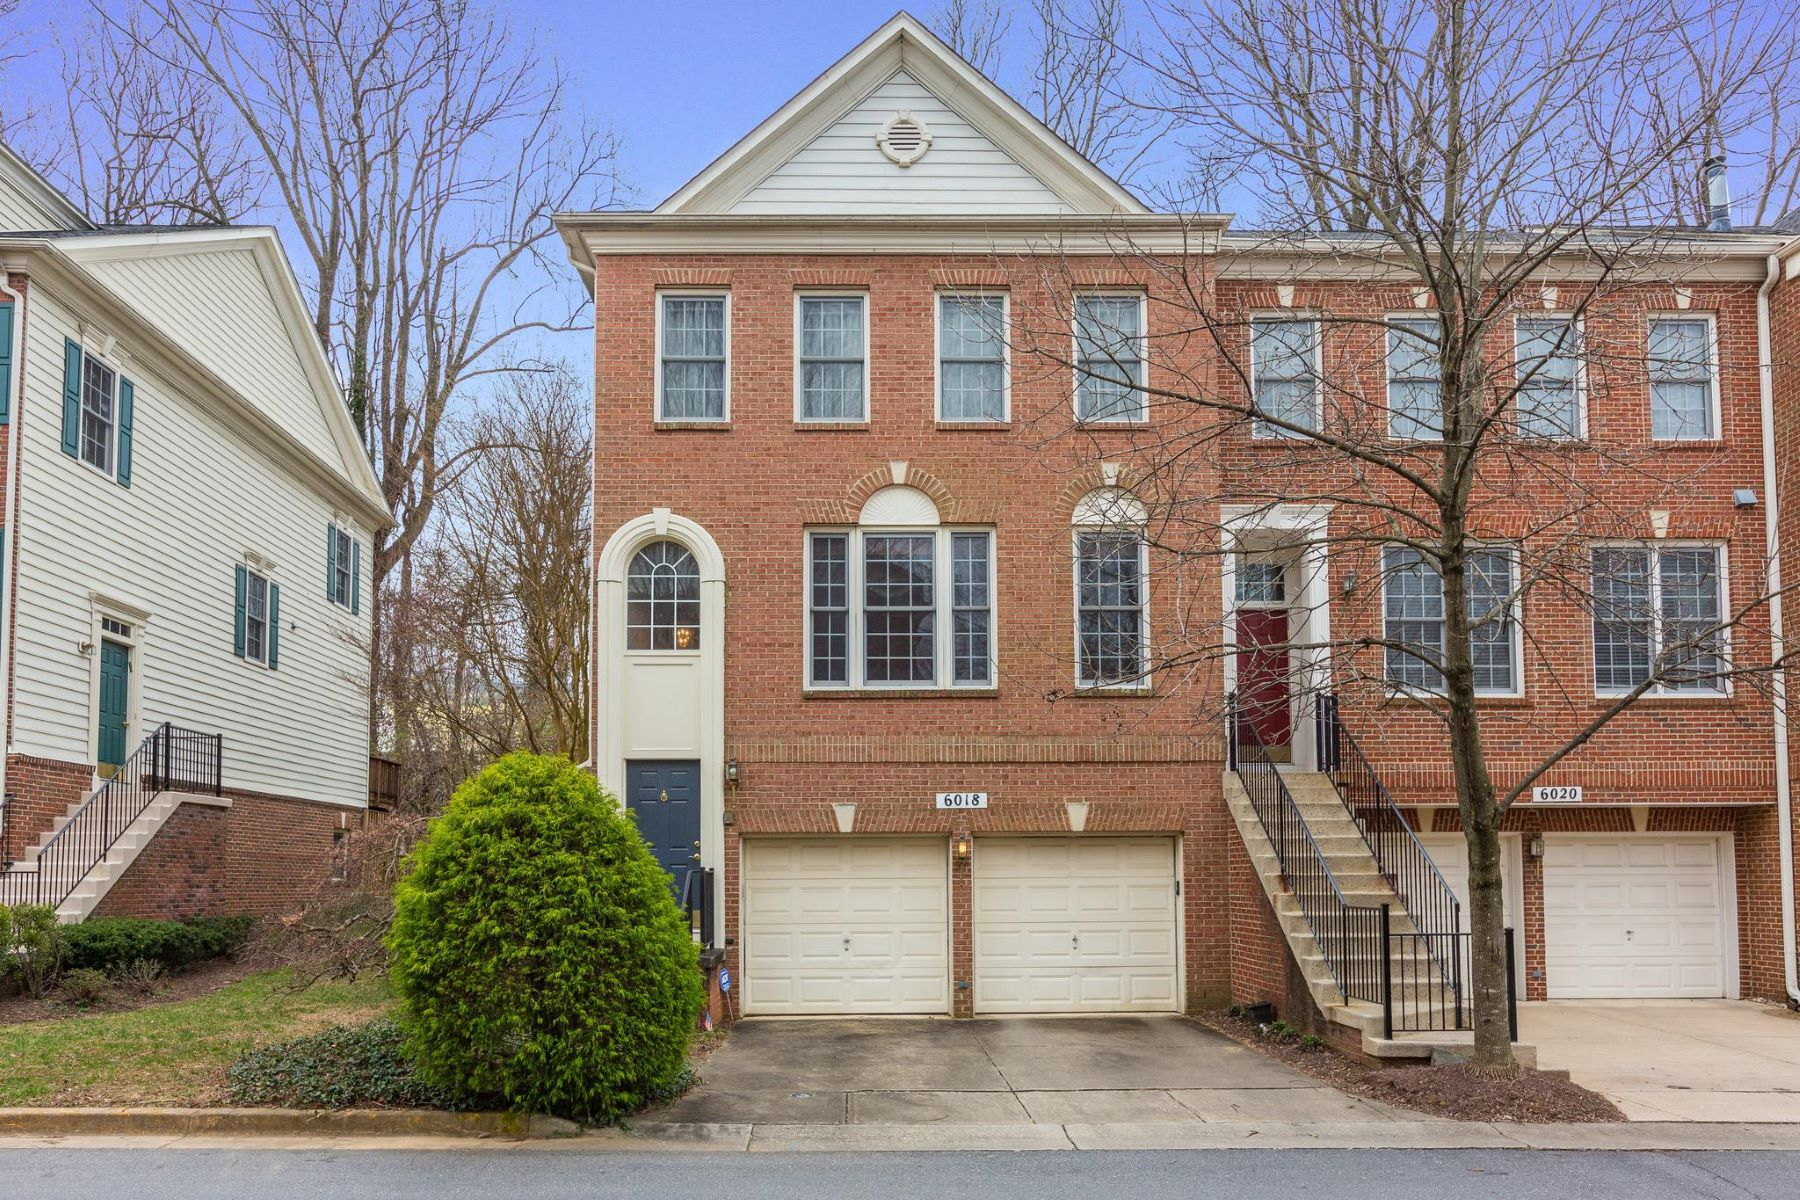 Condominiums for Sale at 6018 Stonehenge Pl #28 Rockville, Maryland 20852 United States